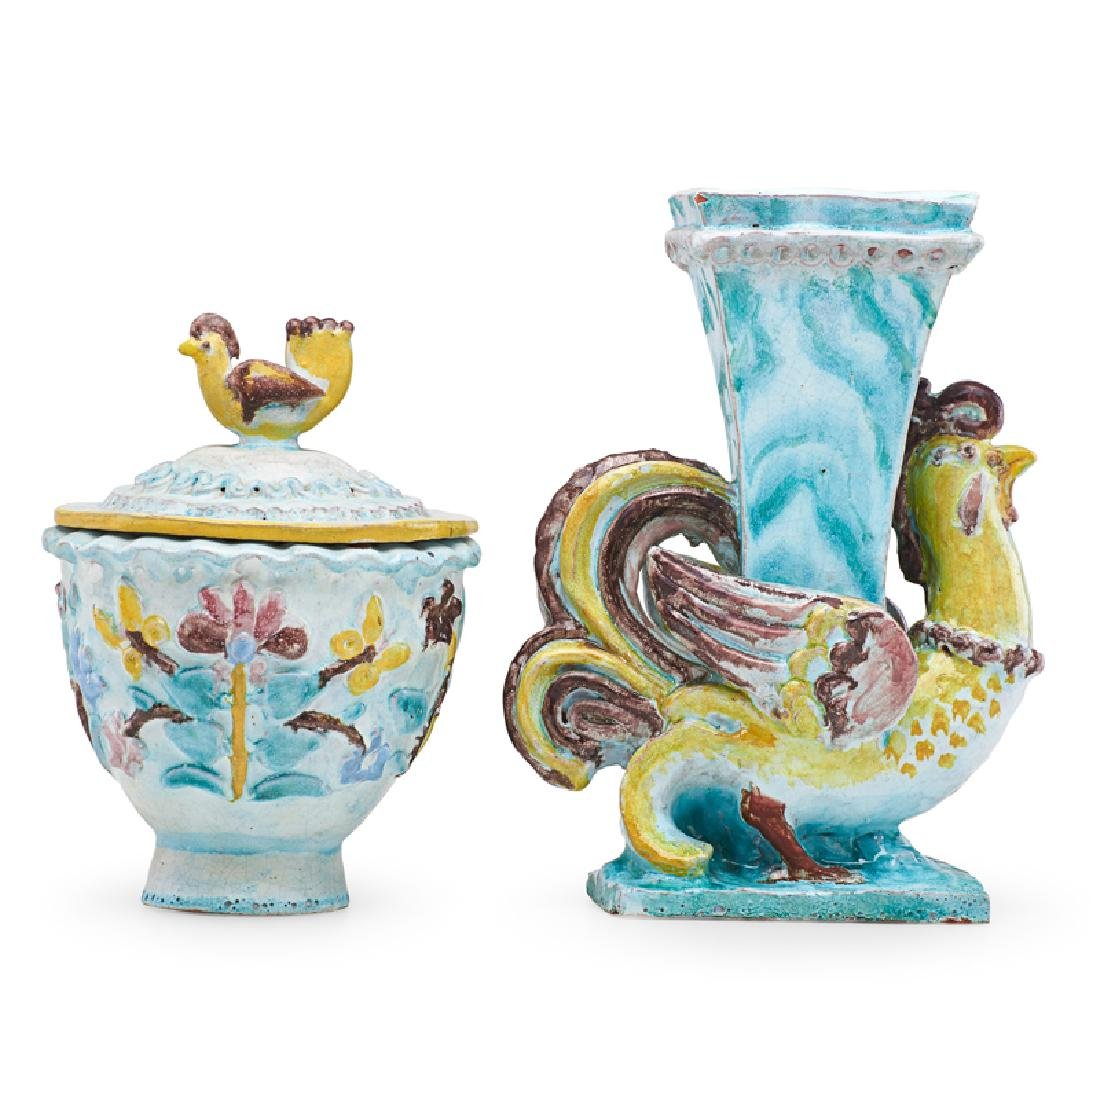 RENE BUTHAUD Vase and lidded vessel - 2